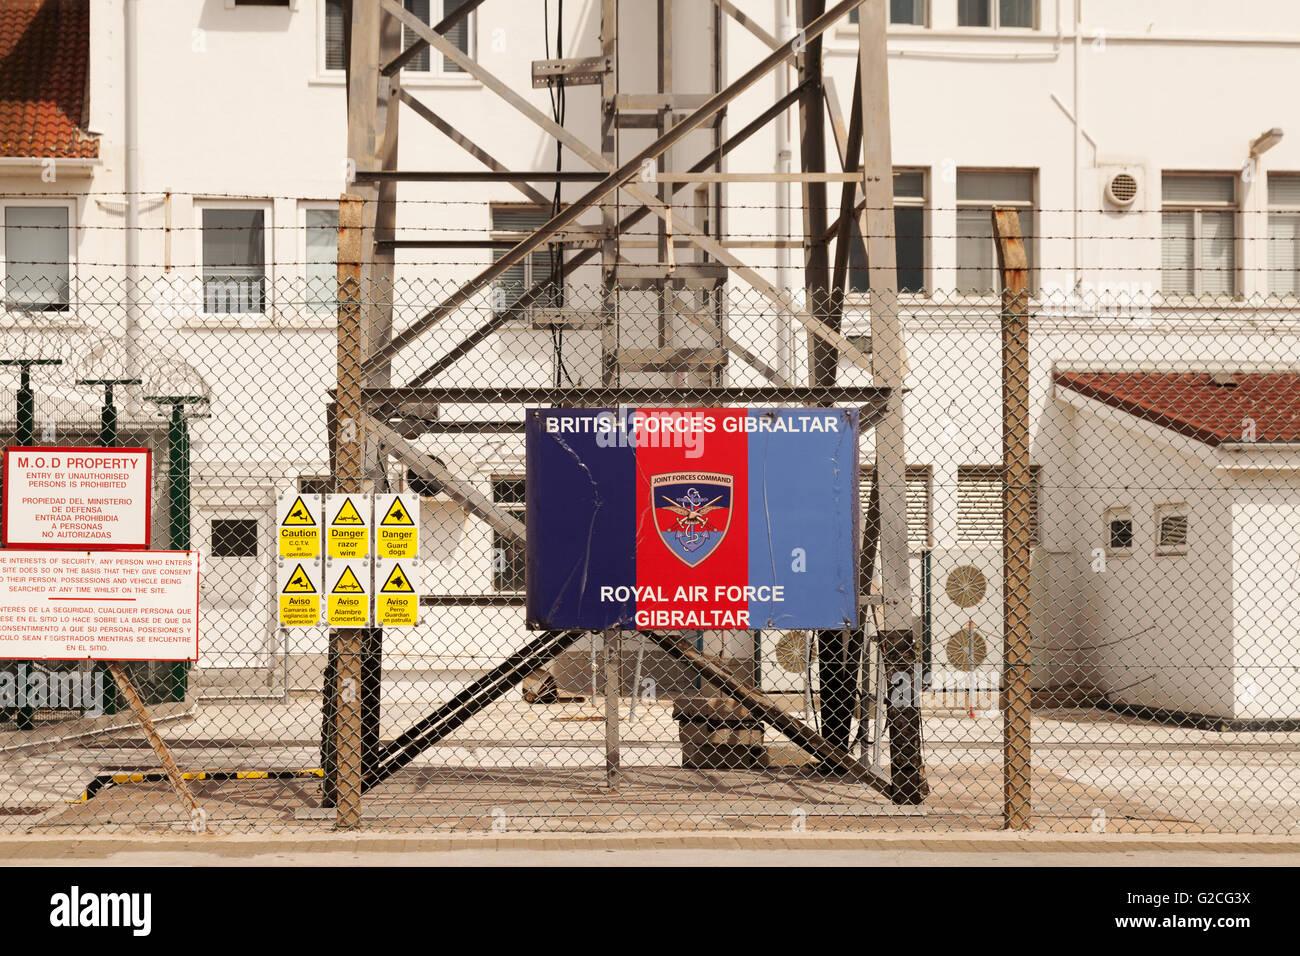 British Forces Gibraltar/RAF Gibraltar premises and sign, Gibraltar Europe Stock Photo